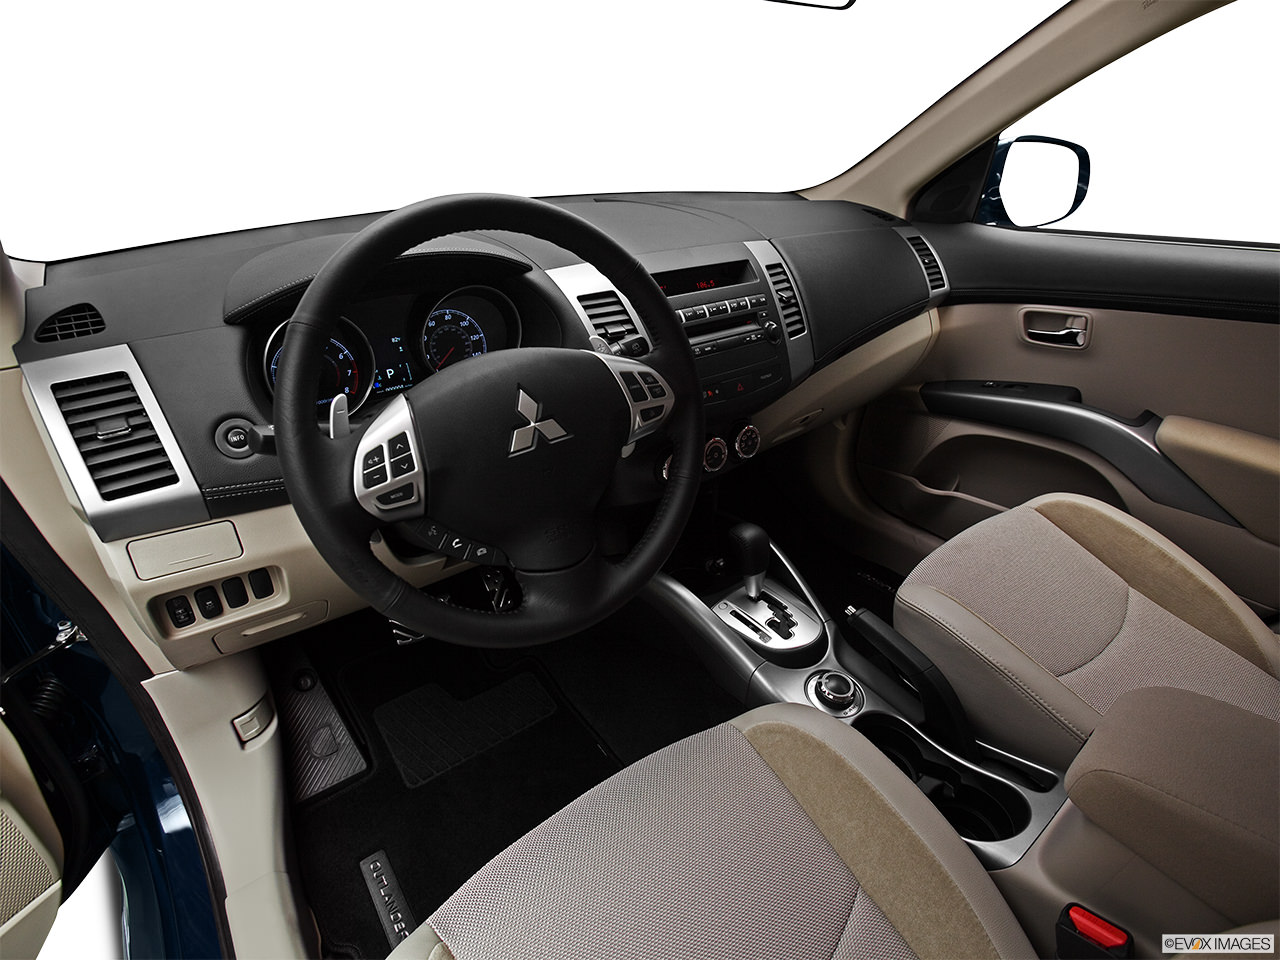 Mitsubishi Outlander 2012 Interior